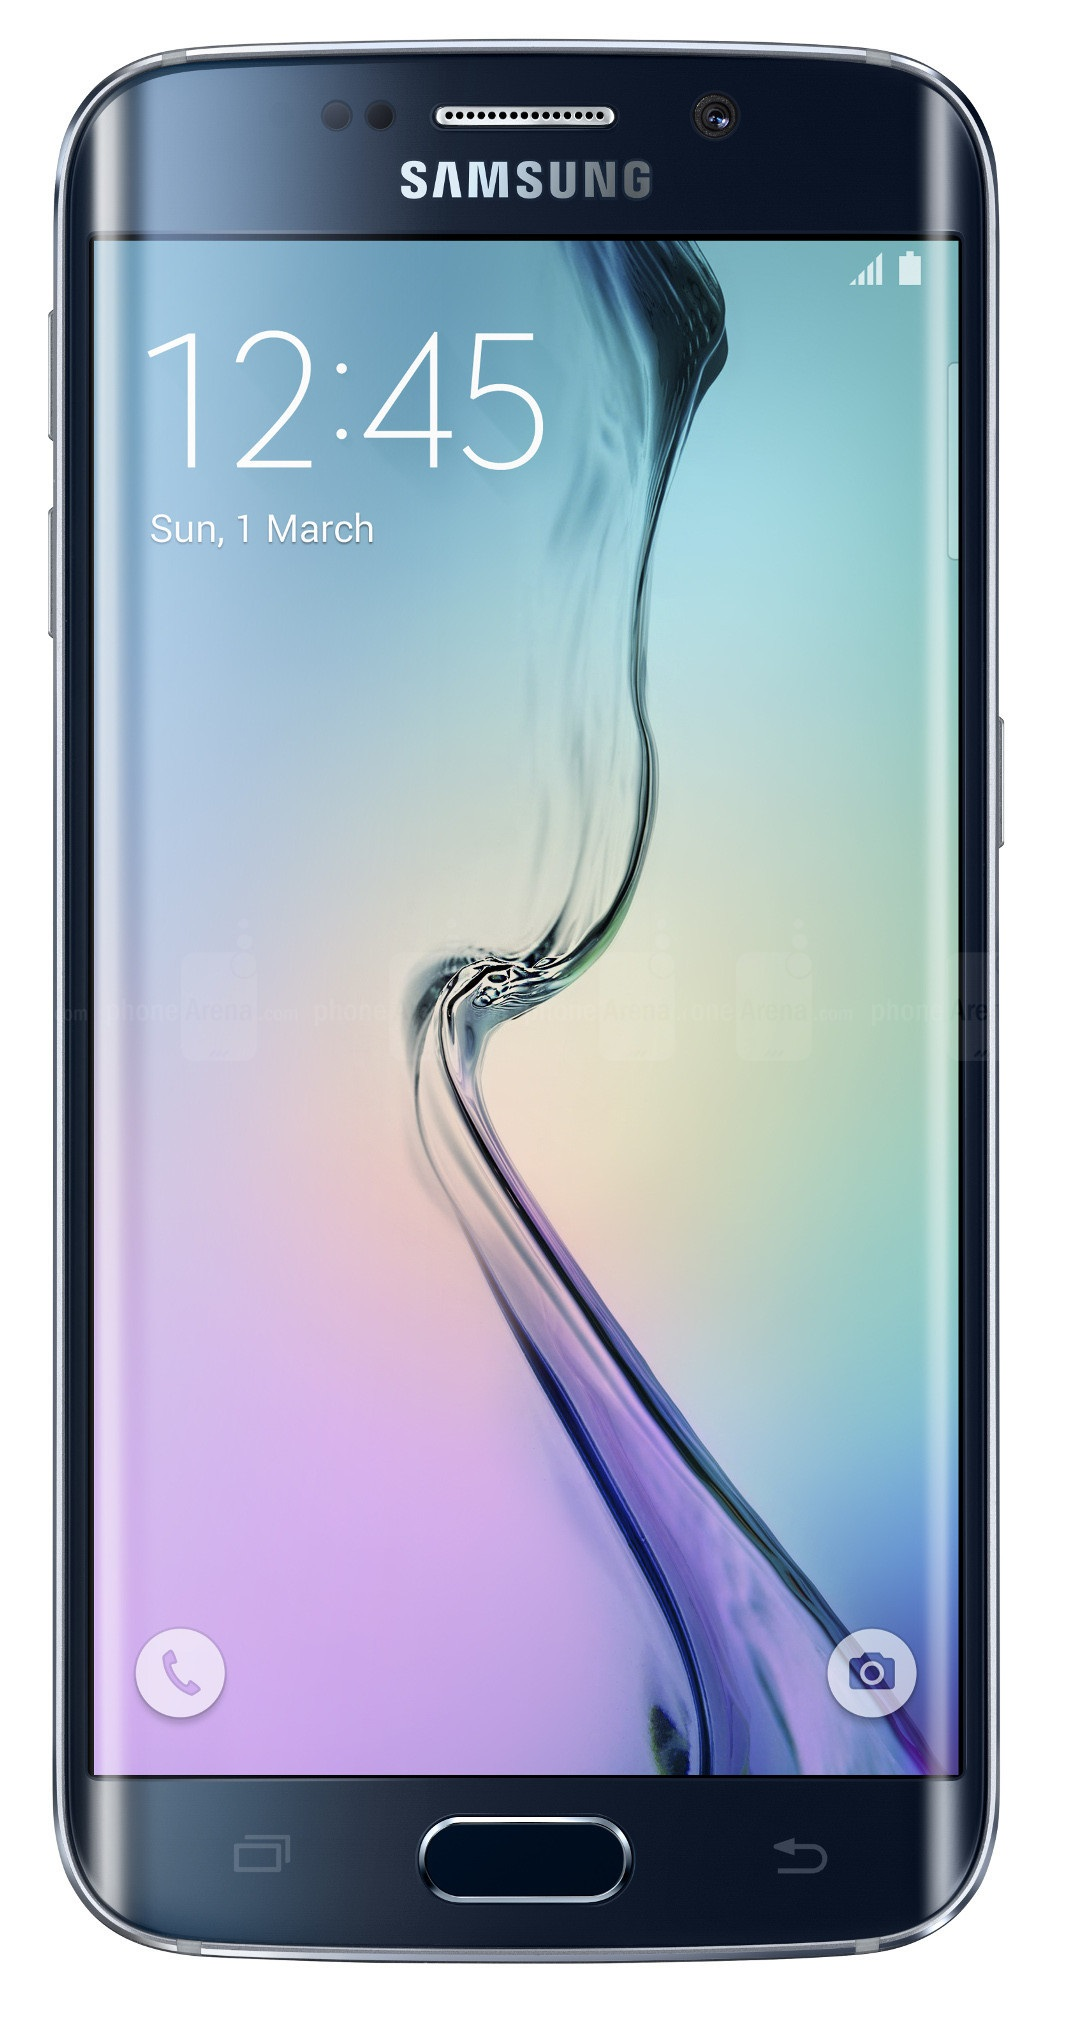 Samsung - Galaxy S6 Edge 4g With 64GB Memory Cell Phone (unlocked) - Black